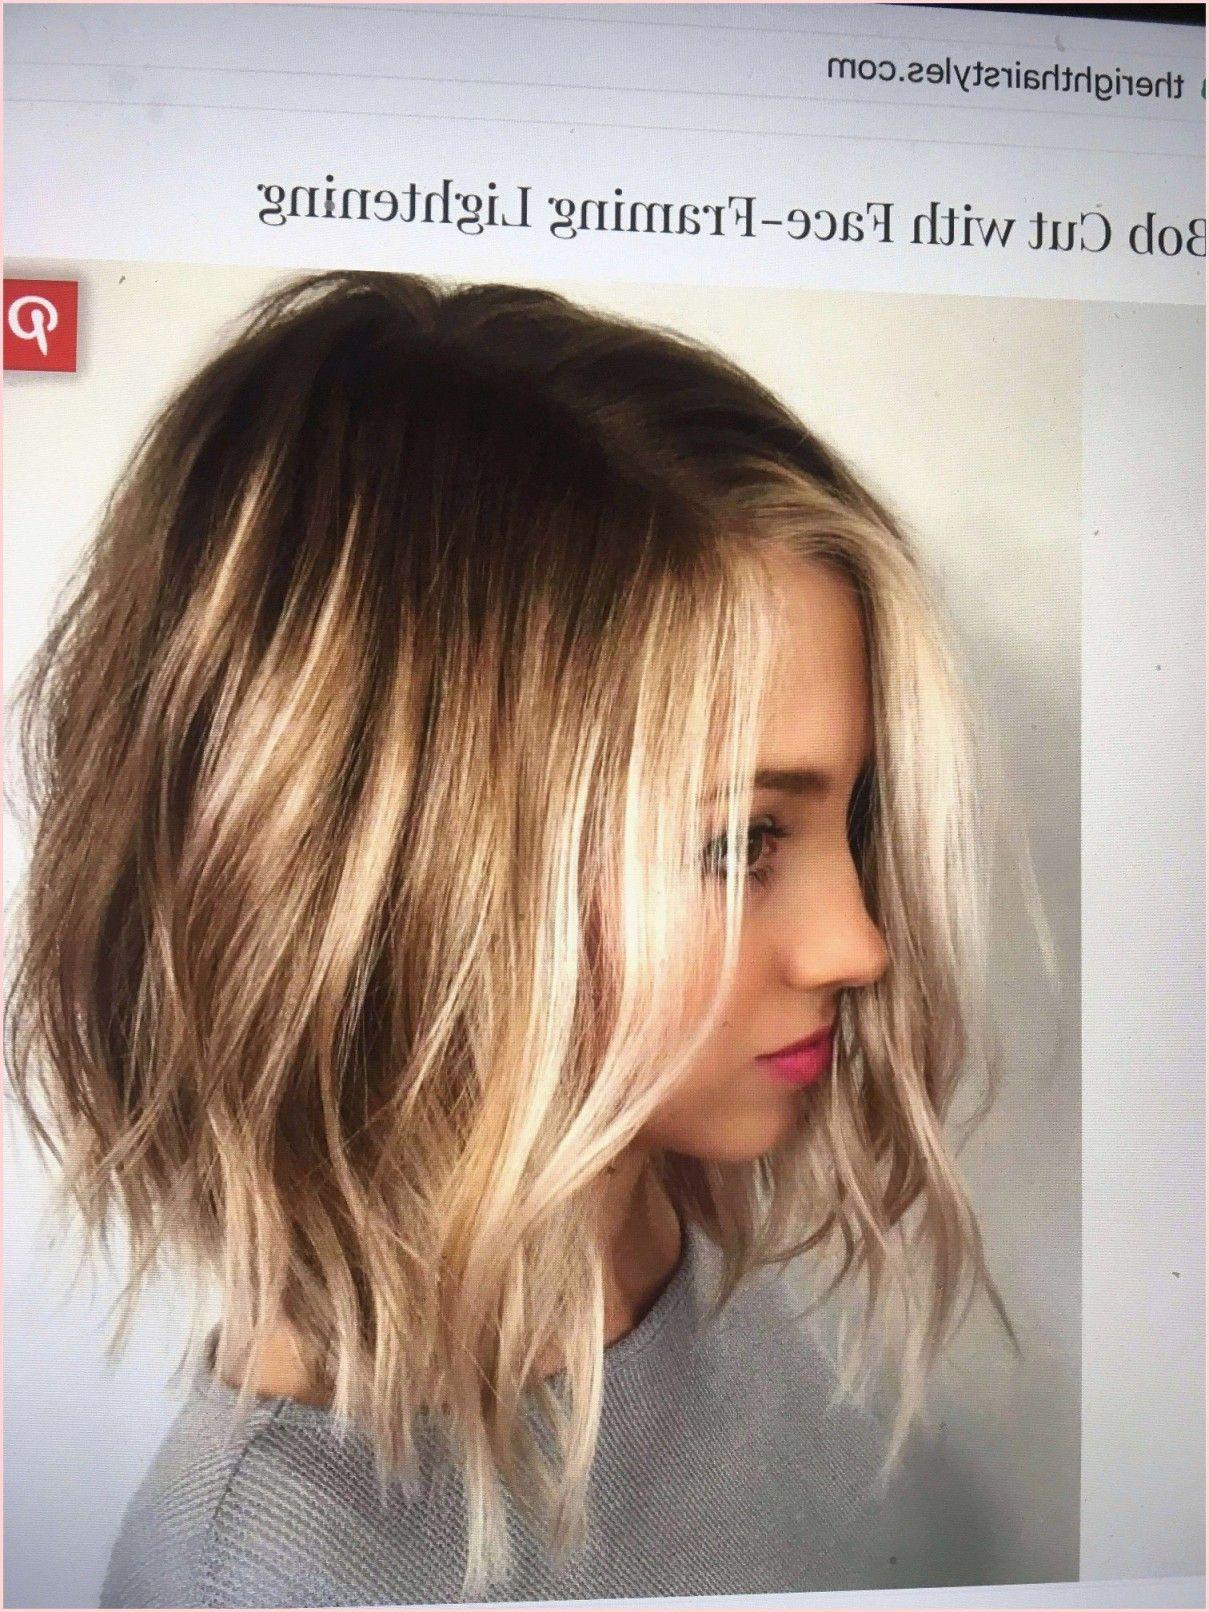 Lovely Frisuren Mittellang Feines Haar Frisur Wenig Haare Langhaarfrisuren Bob Frisur